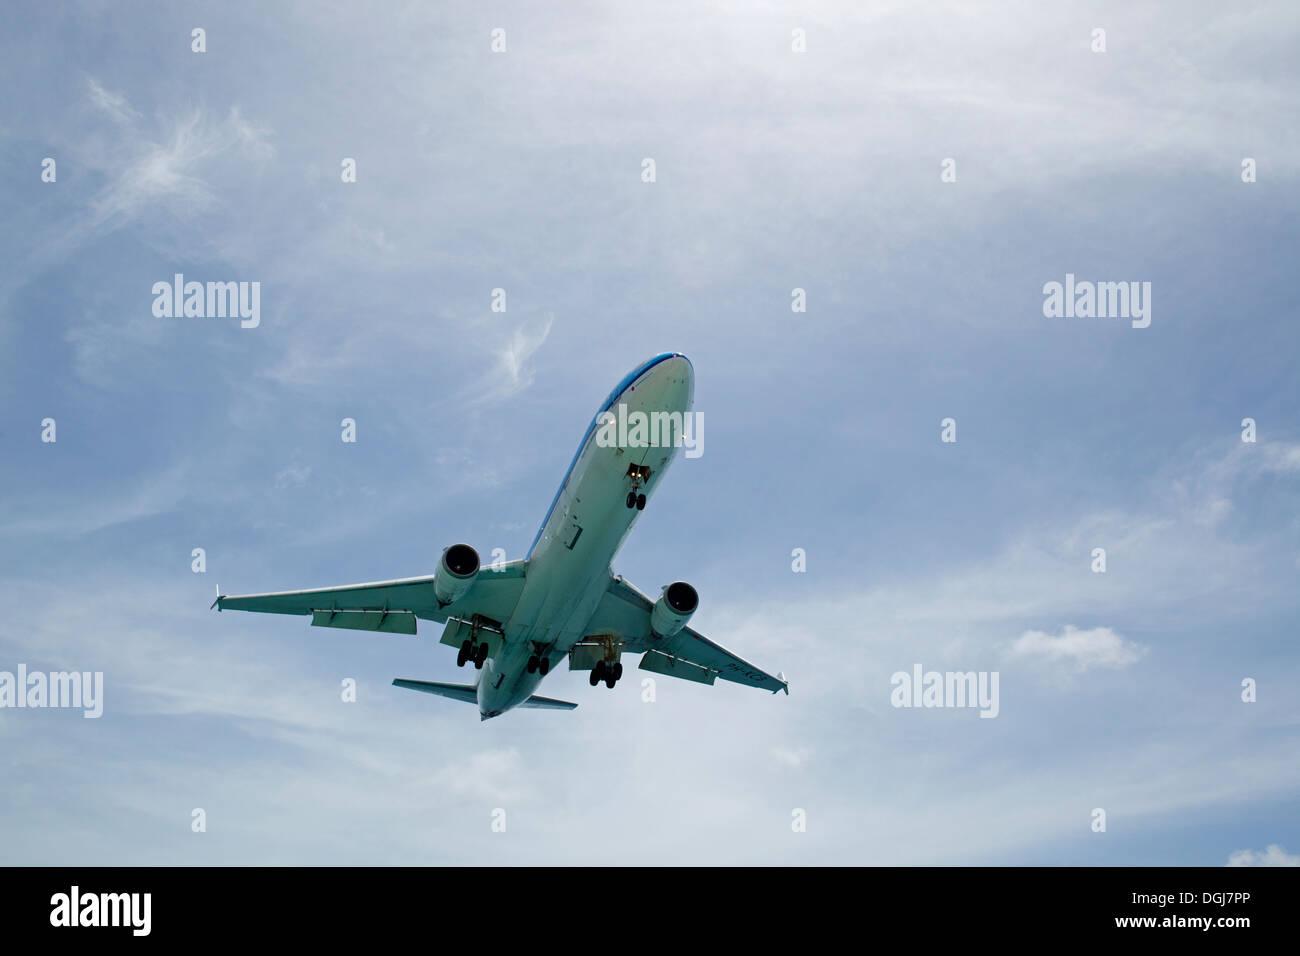 KLM passenger jet coming into land at Flamingo Airport. - Stock Image